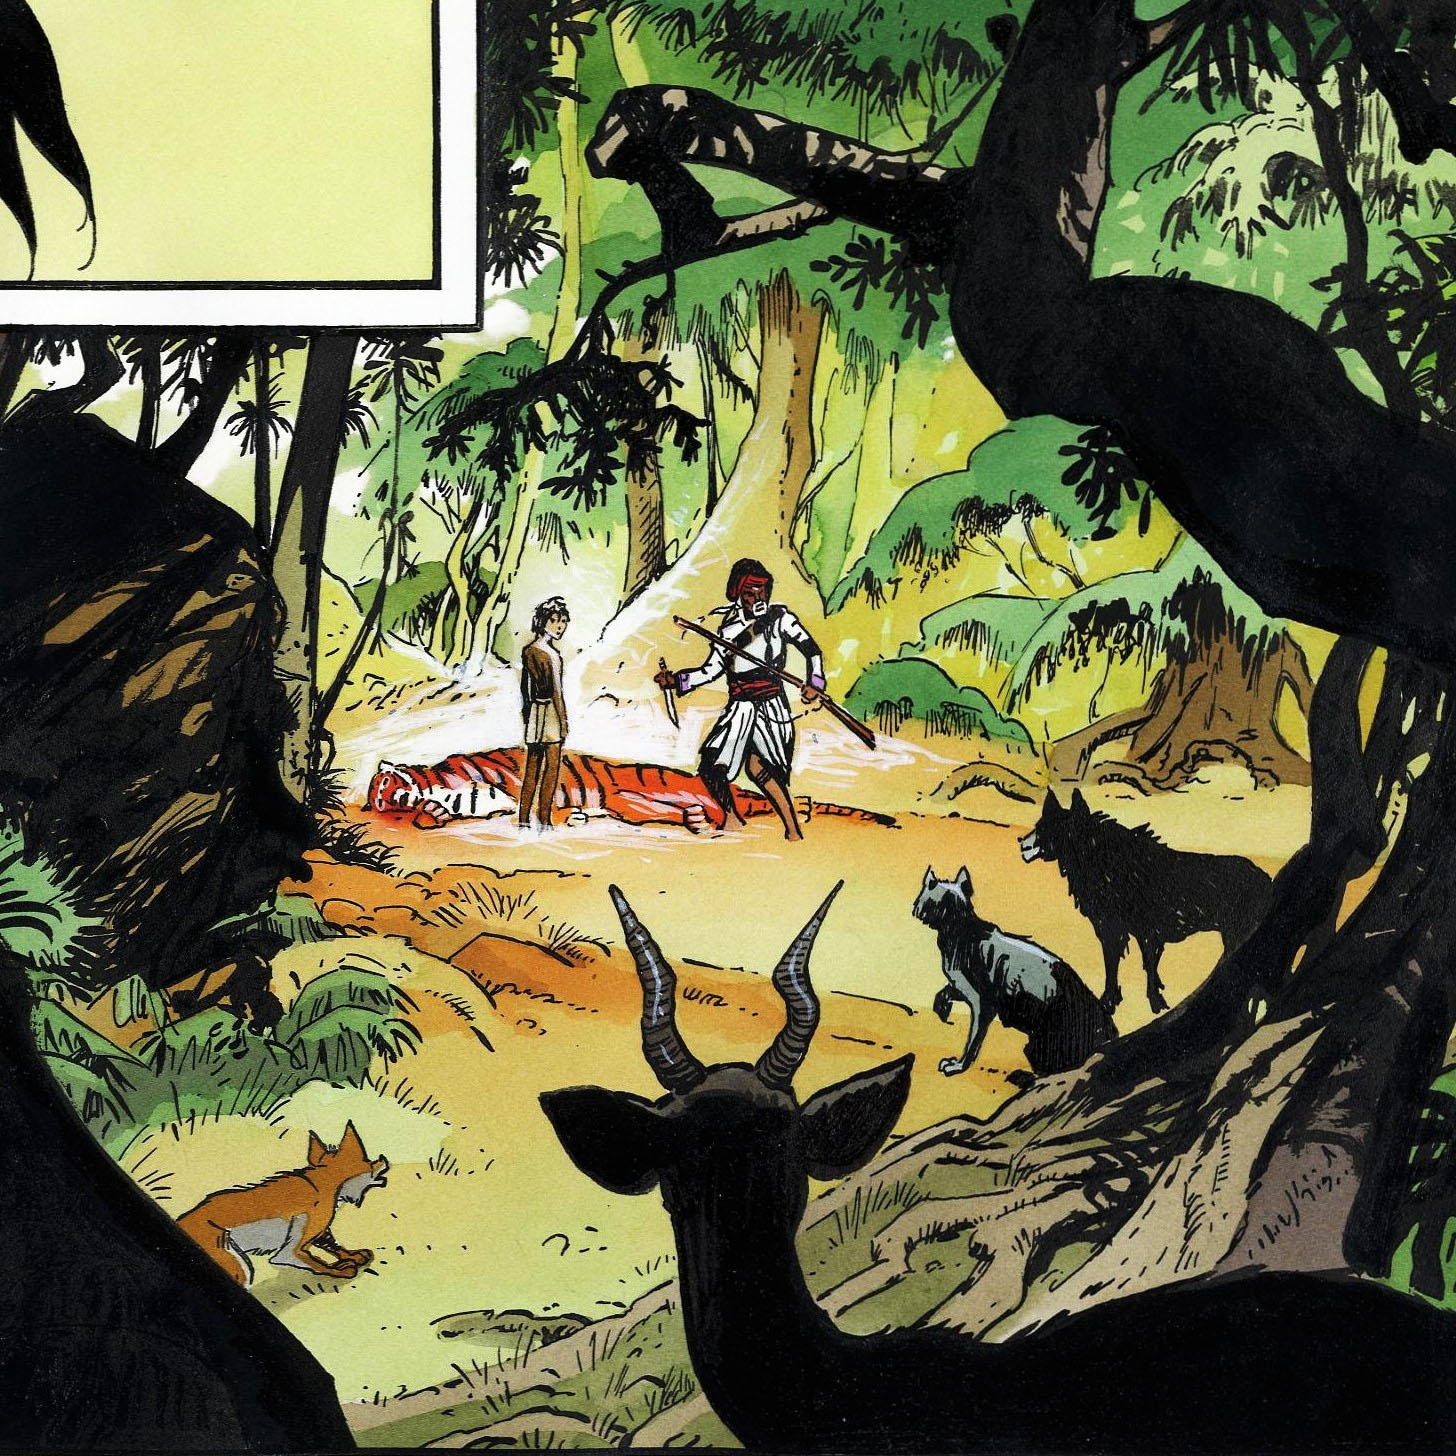 2006 Le Dernier Livre De La Jungle Het Laatste